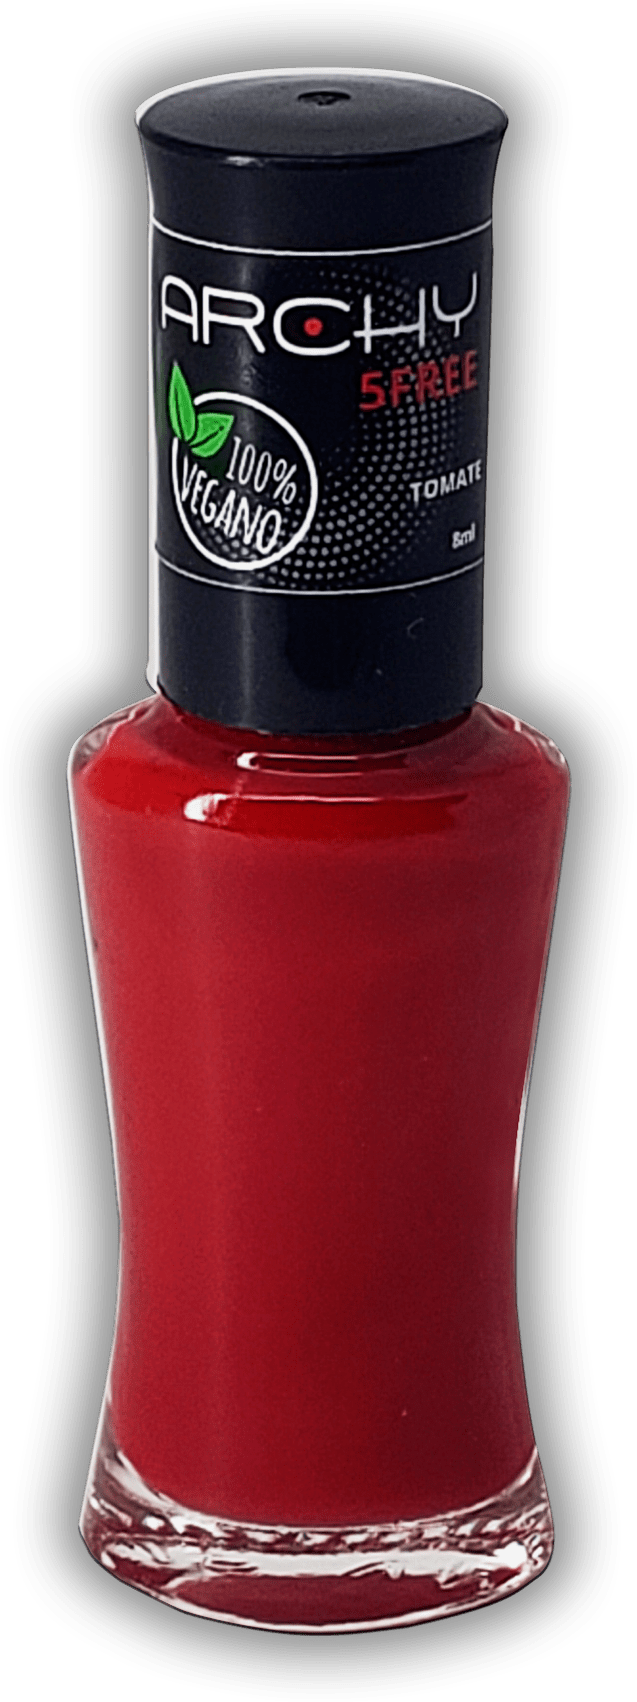 Esmalte Vegano 5 Free Tomate- Archy Make Up